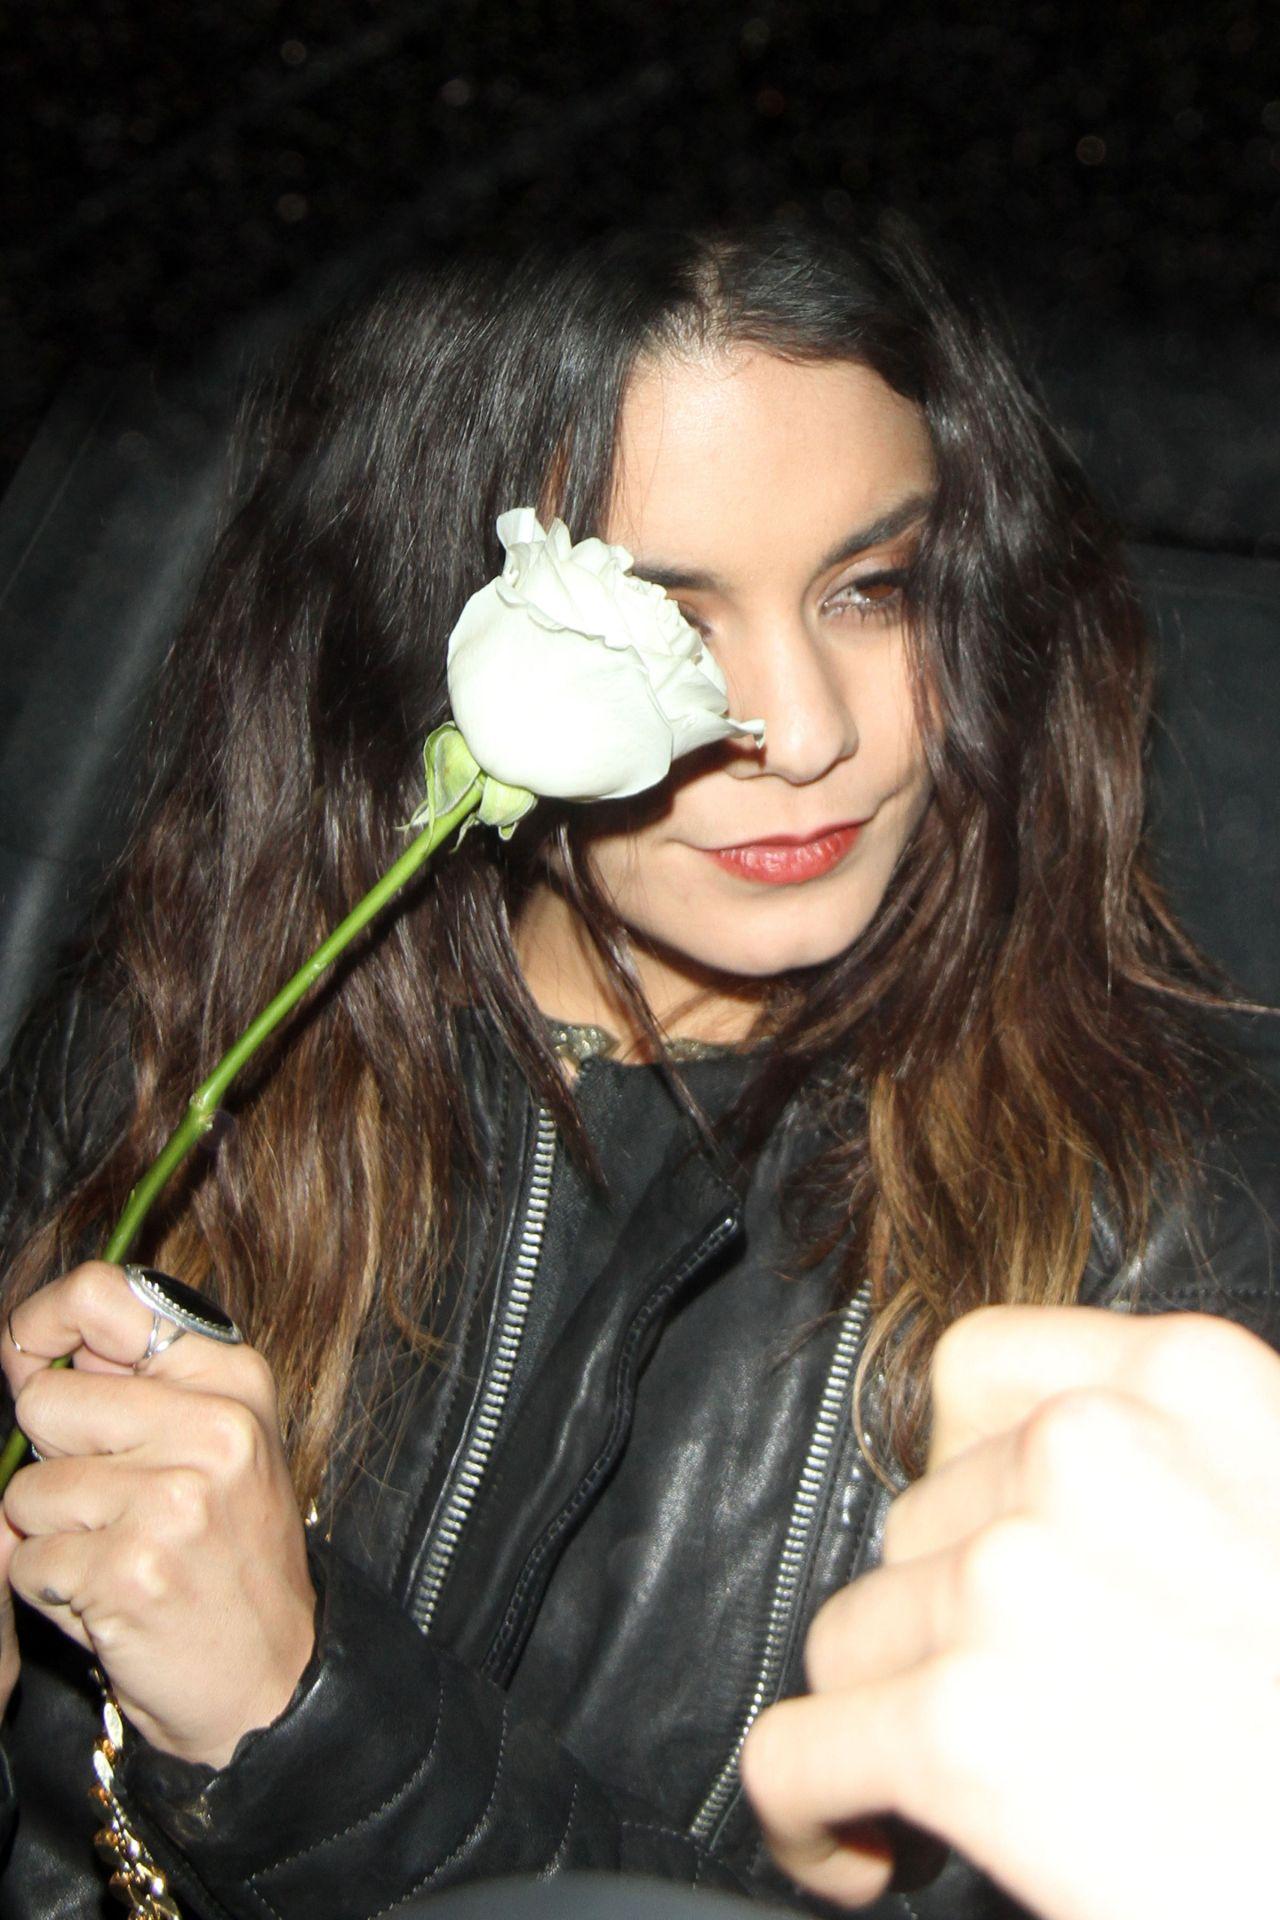 Vanessa Hudgens Carries a White Rose - Laura Vandervoort